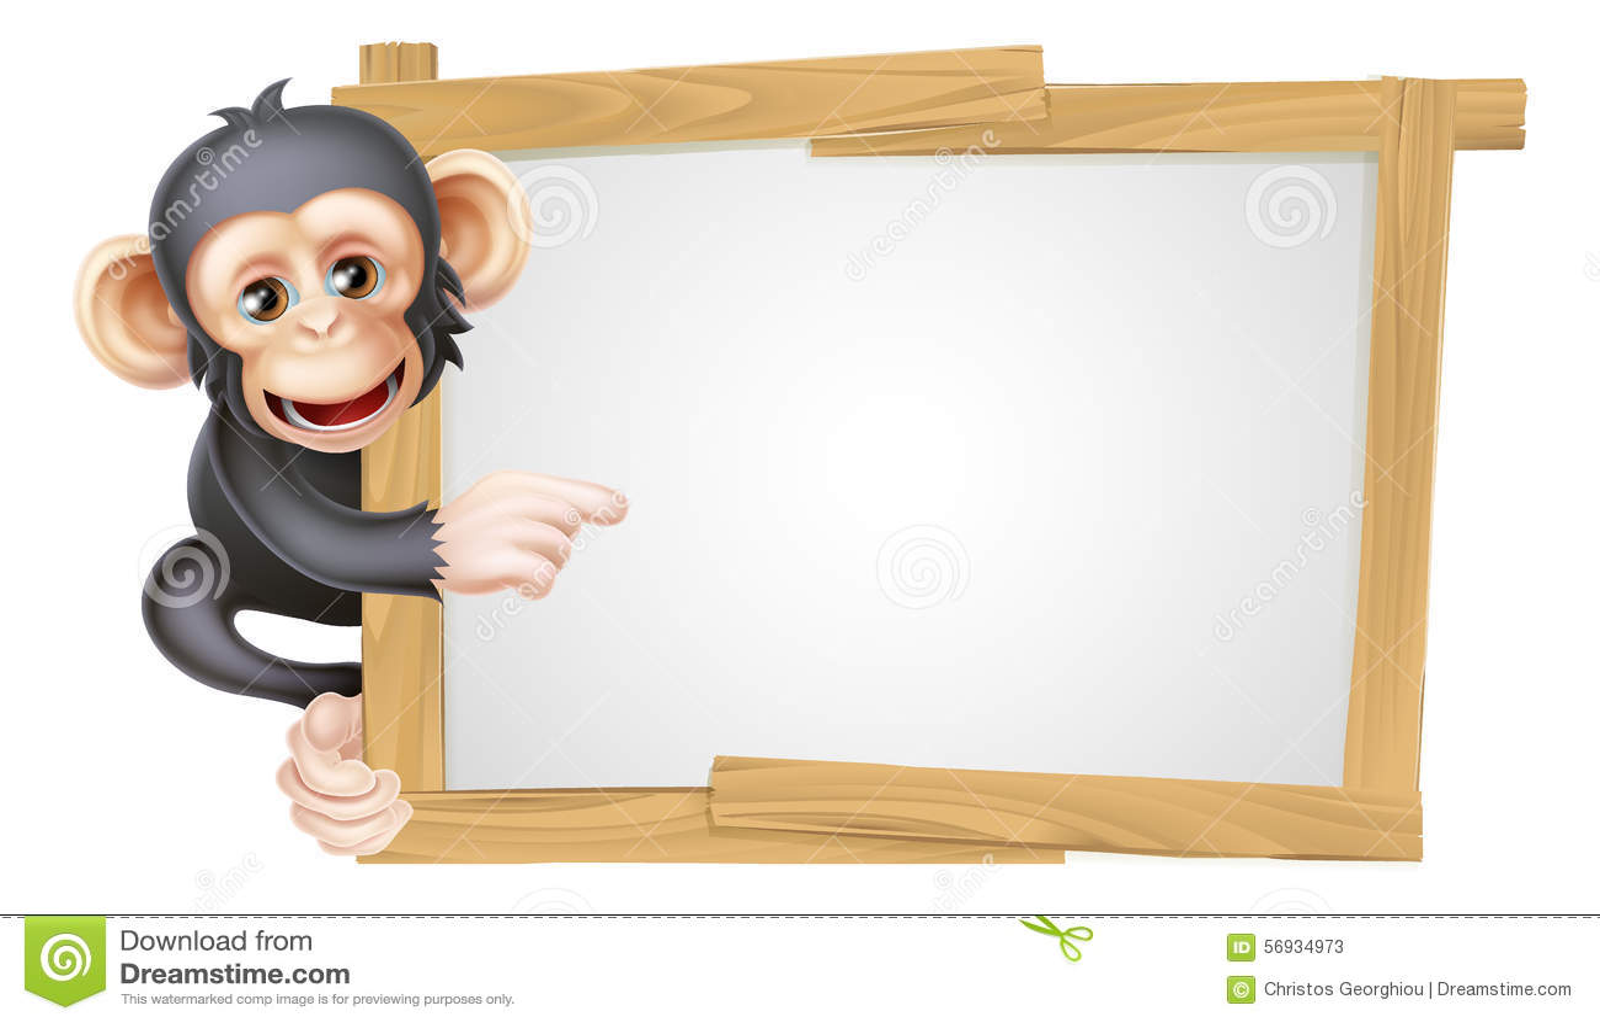 Cartoon Chimp Sign Stock Vector - Image: 56934973